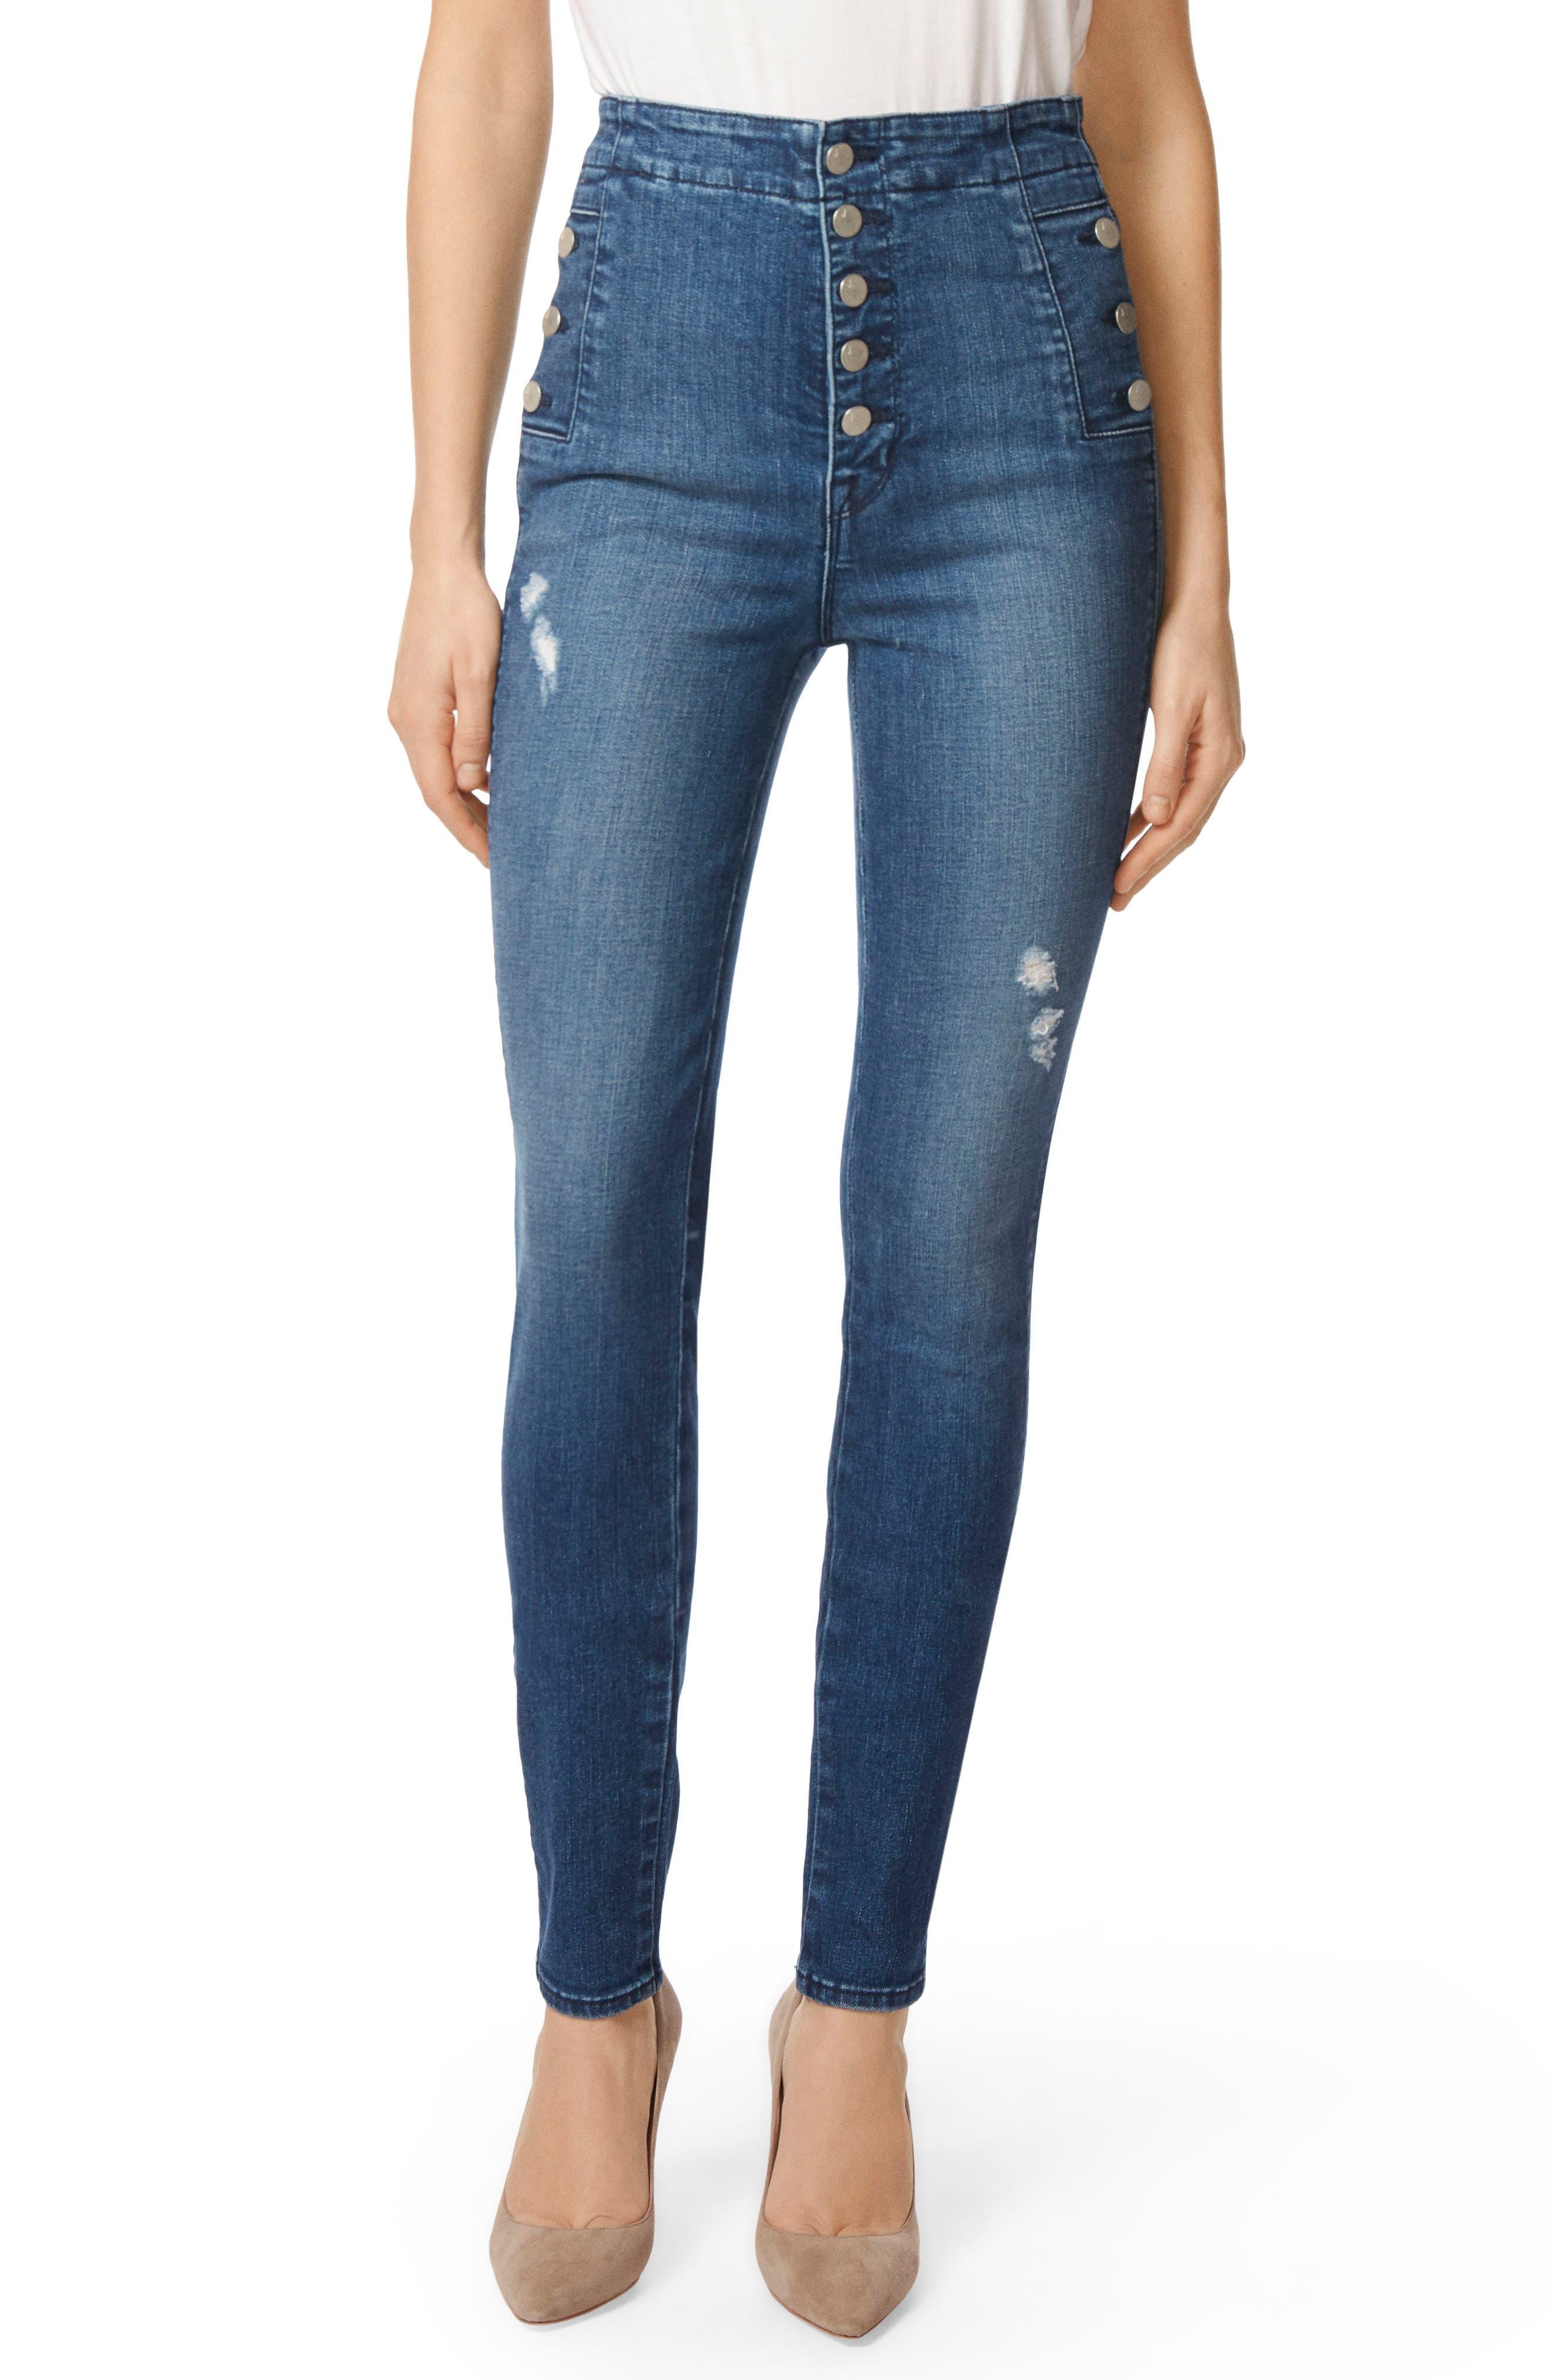 Natasha Sky High High Waist Skinny Jeans,                             Main thumbnail 1, color,                             234